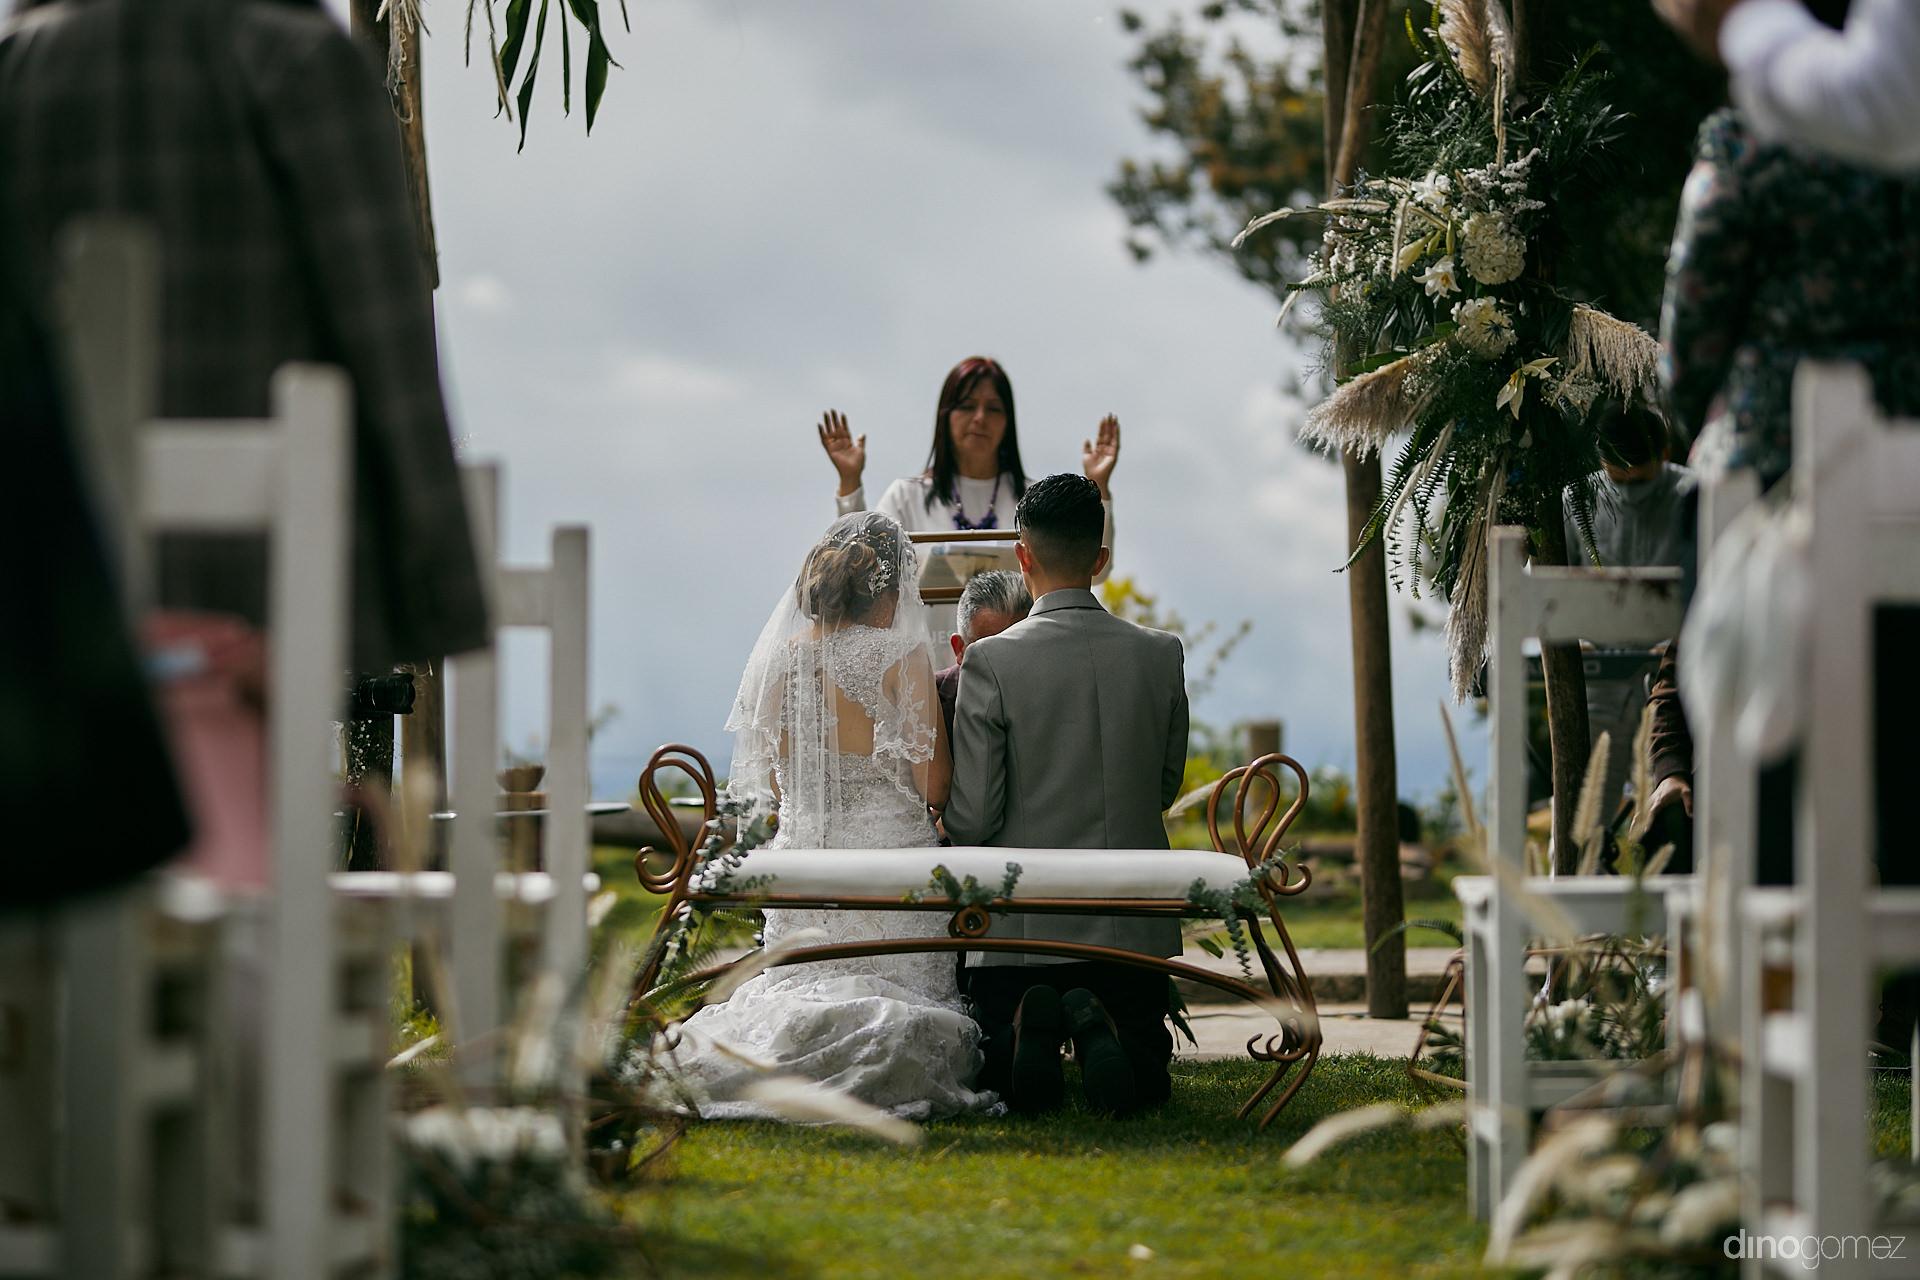 006 - Diy Budget Destination Weddings Can Be Prety Too!